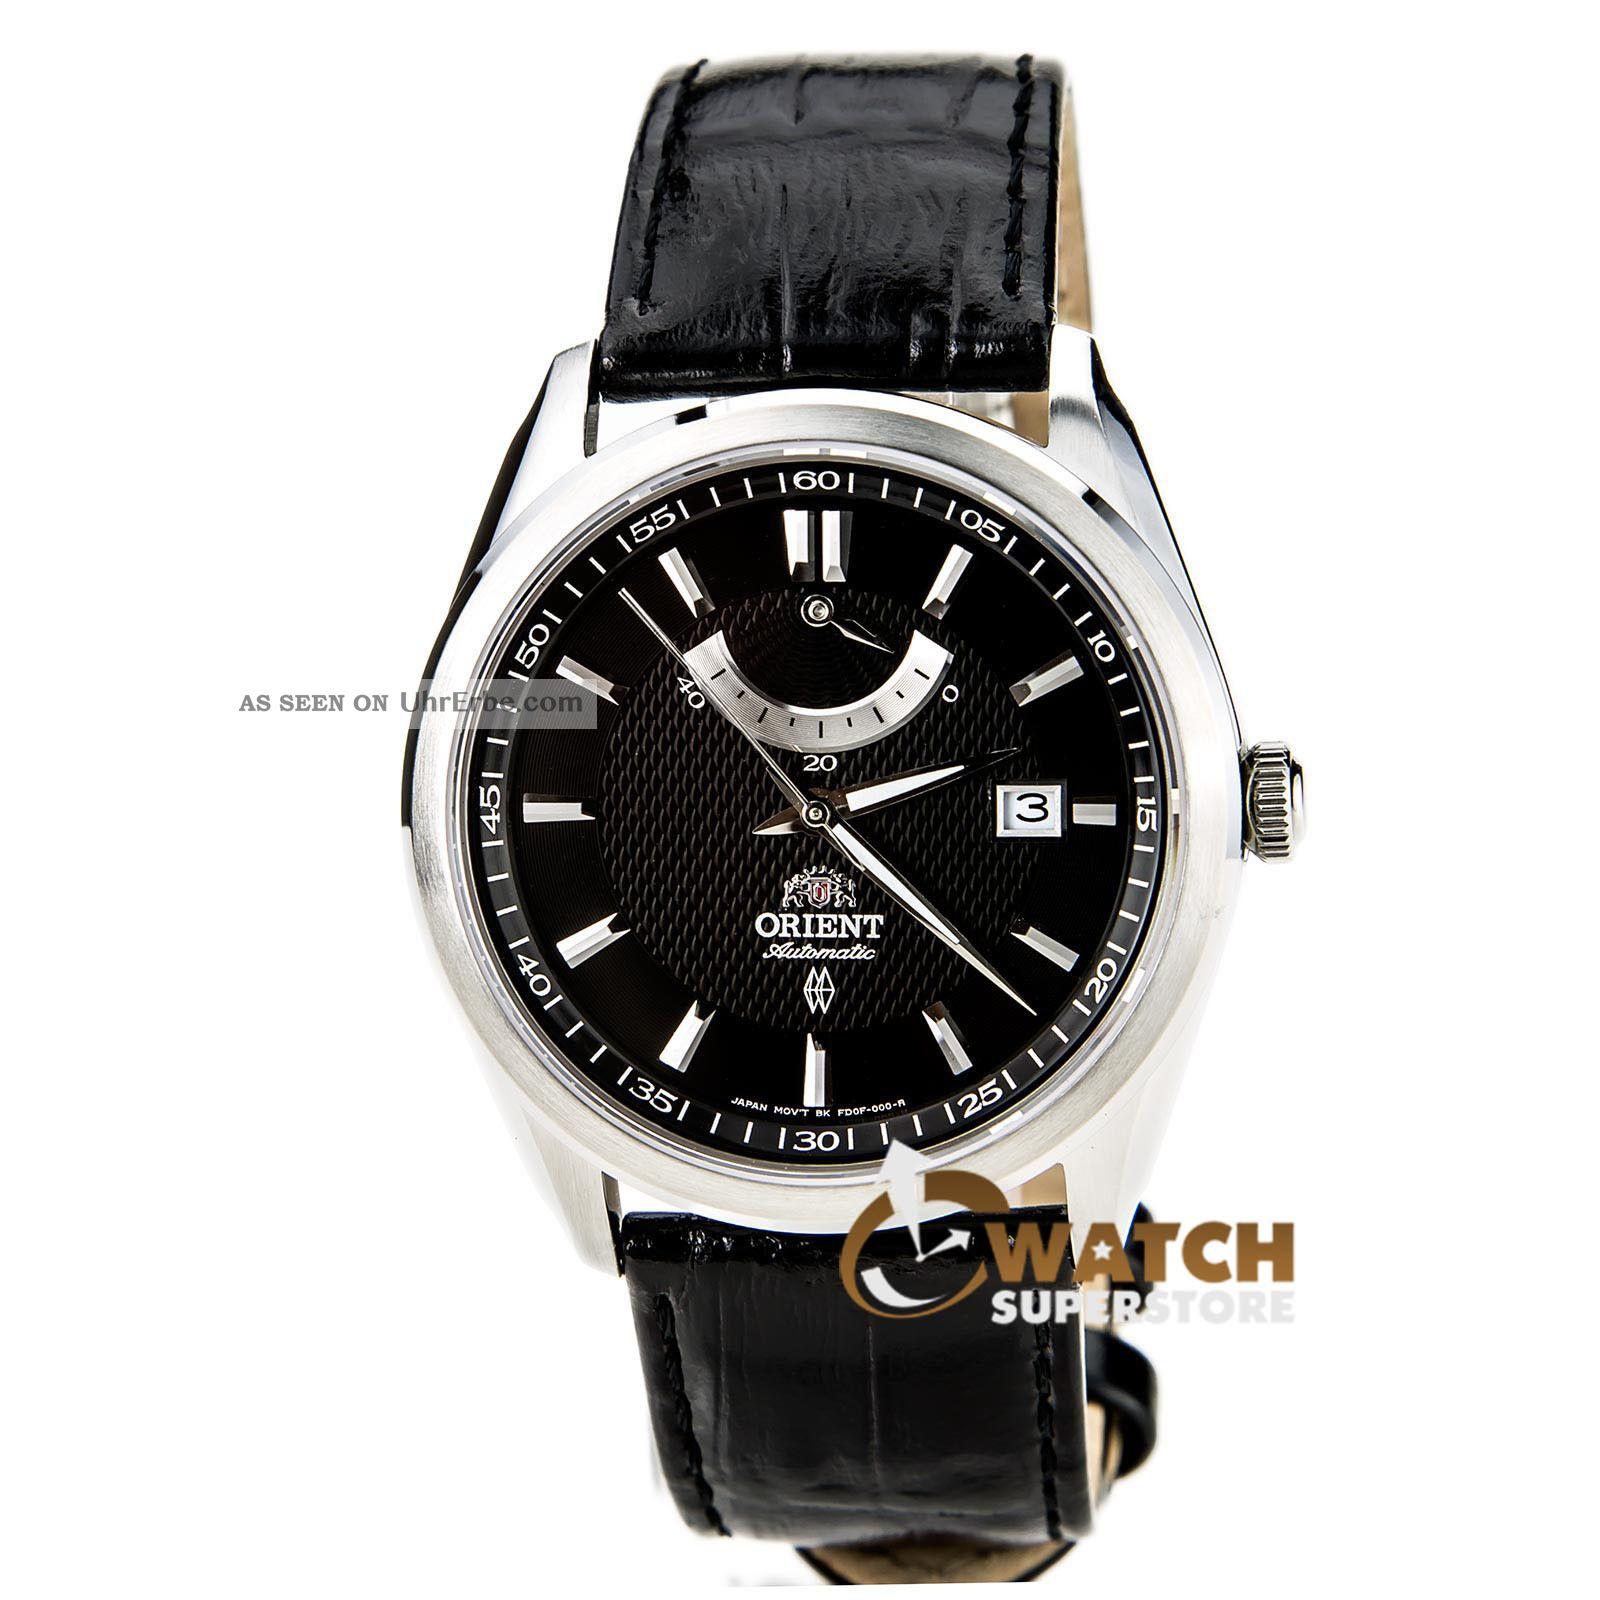 Herren Armbanduhr Orient Ffd0f002b Schwarzes Leder Armband Automatisch Vintage Armbanduhren Bild